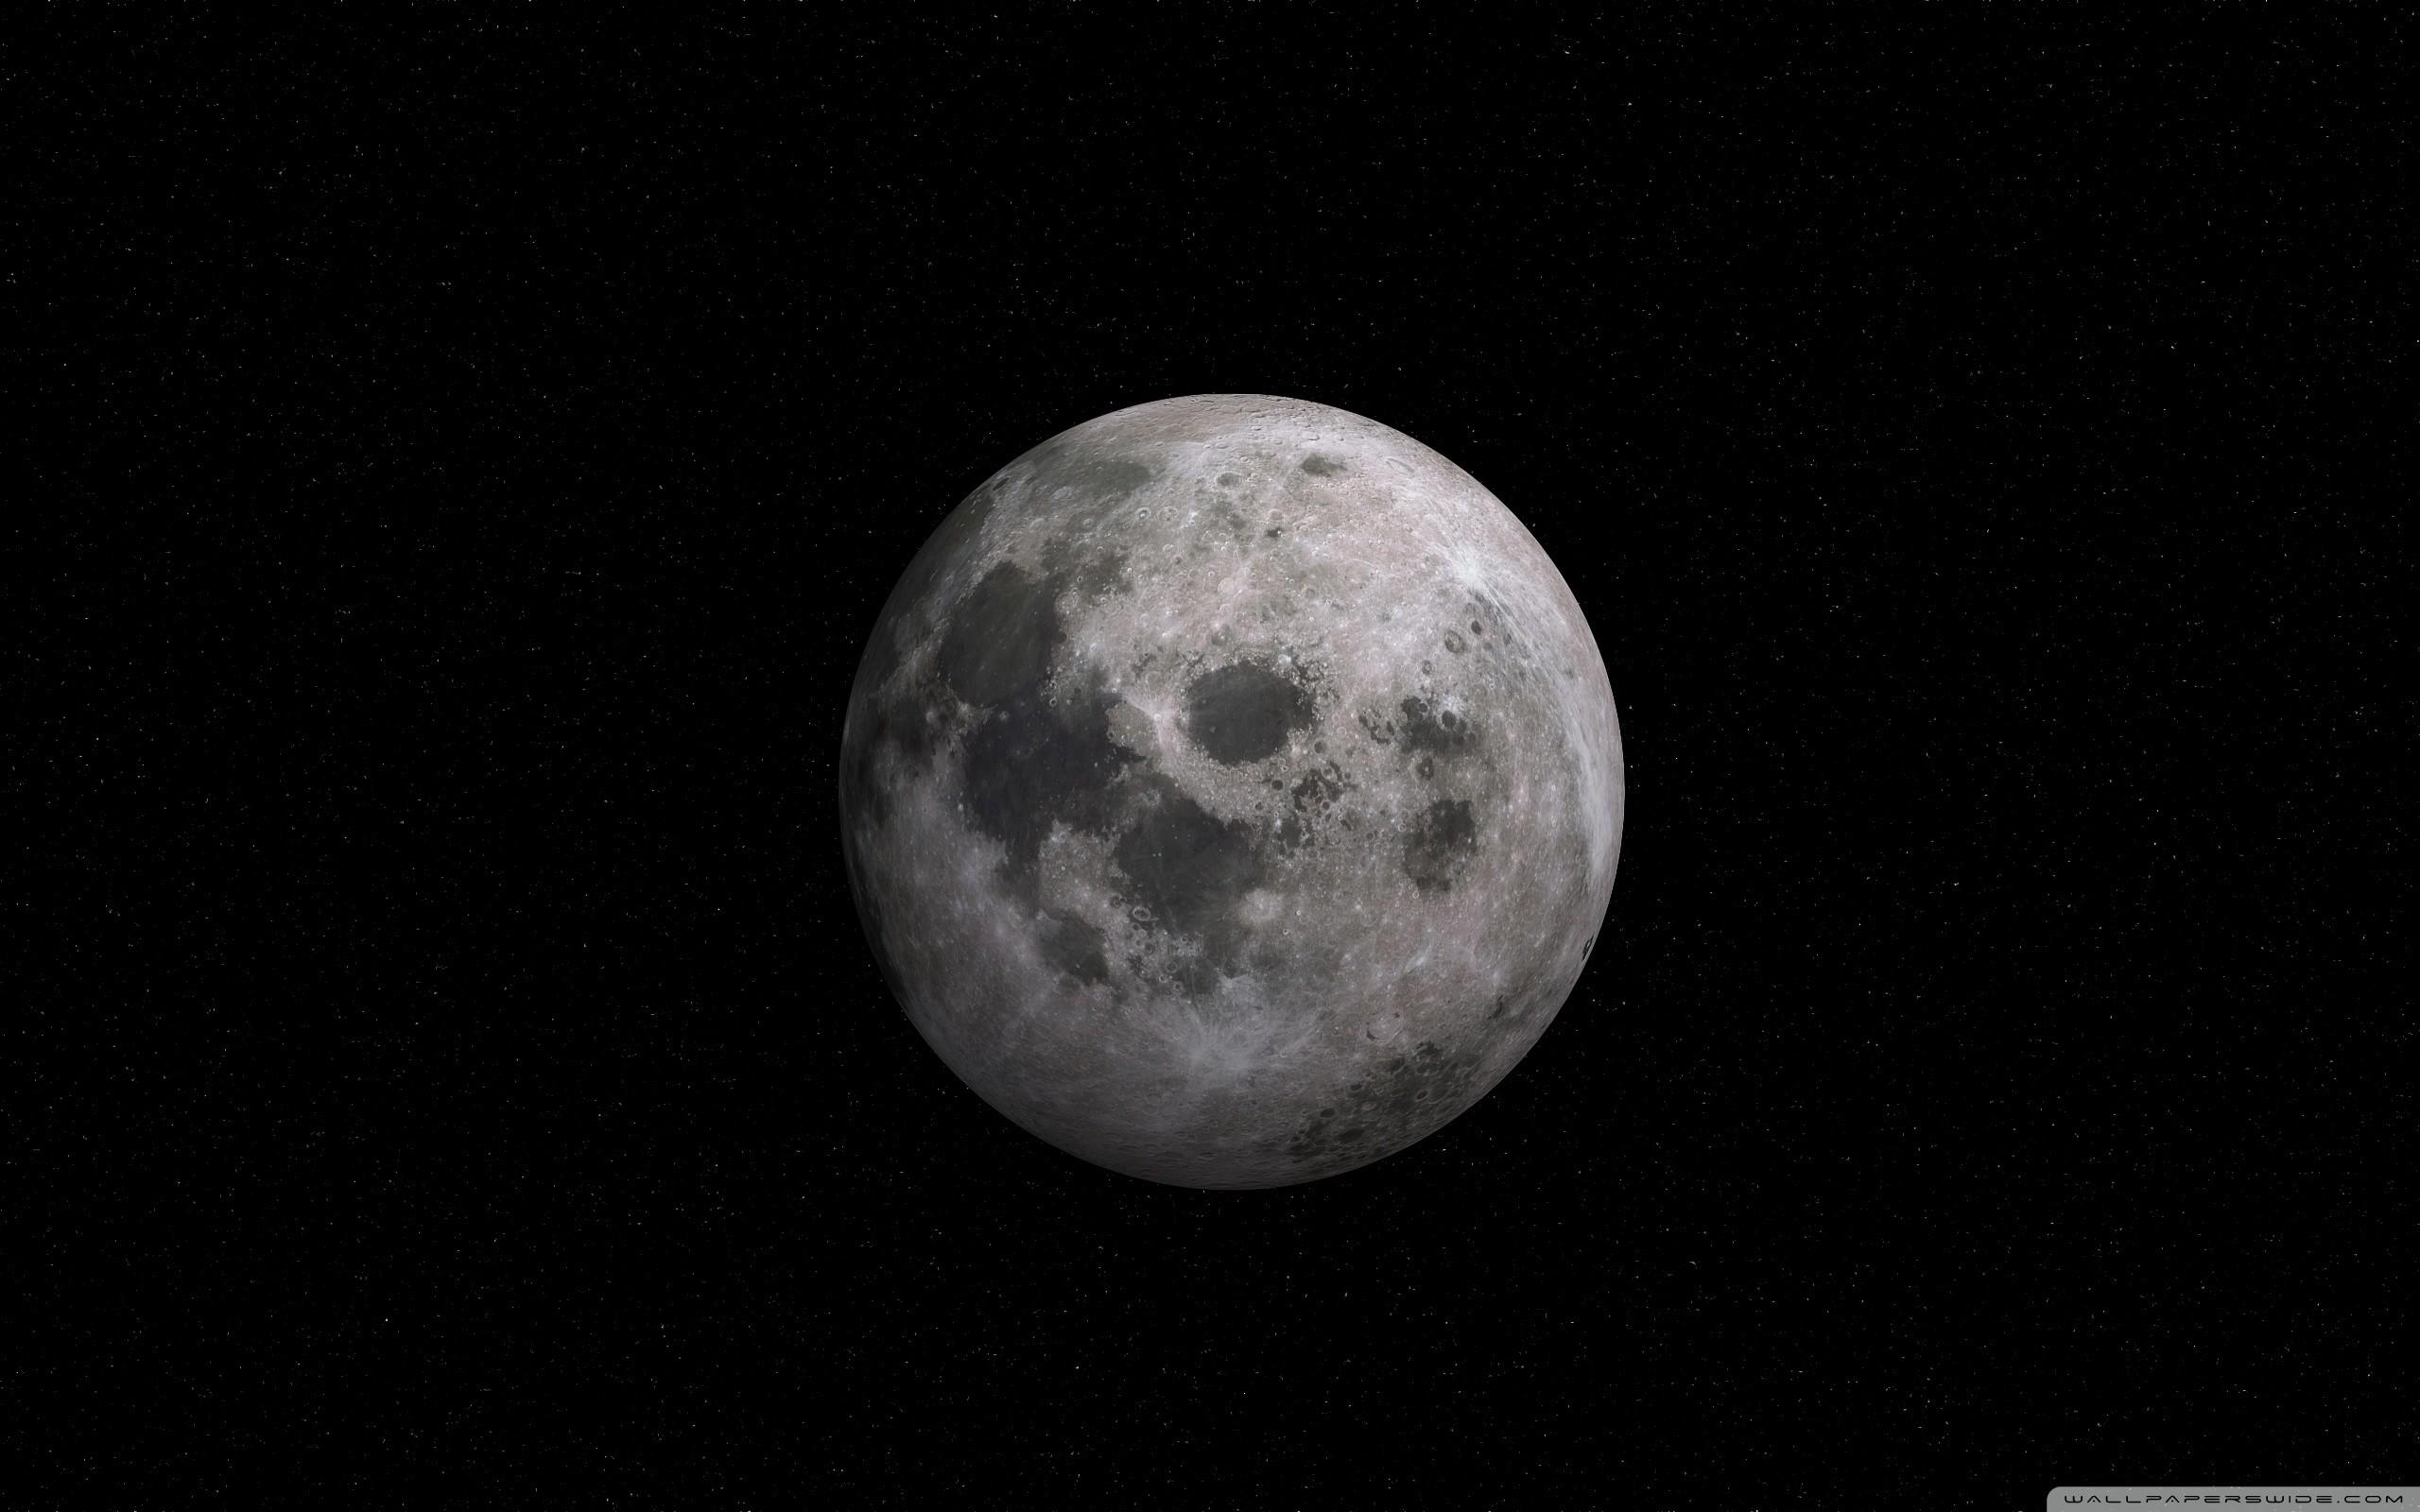 Moon HD Wide Wallpaper for Widescreen